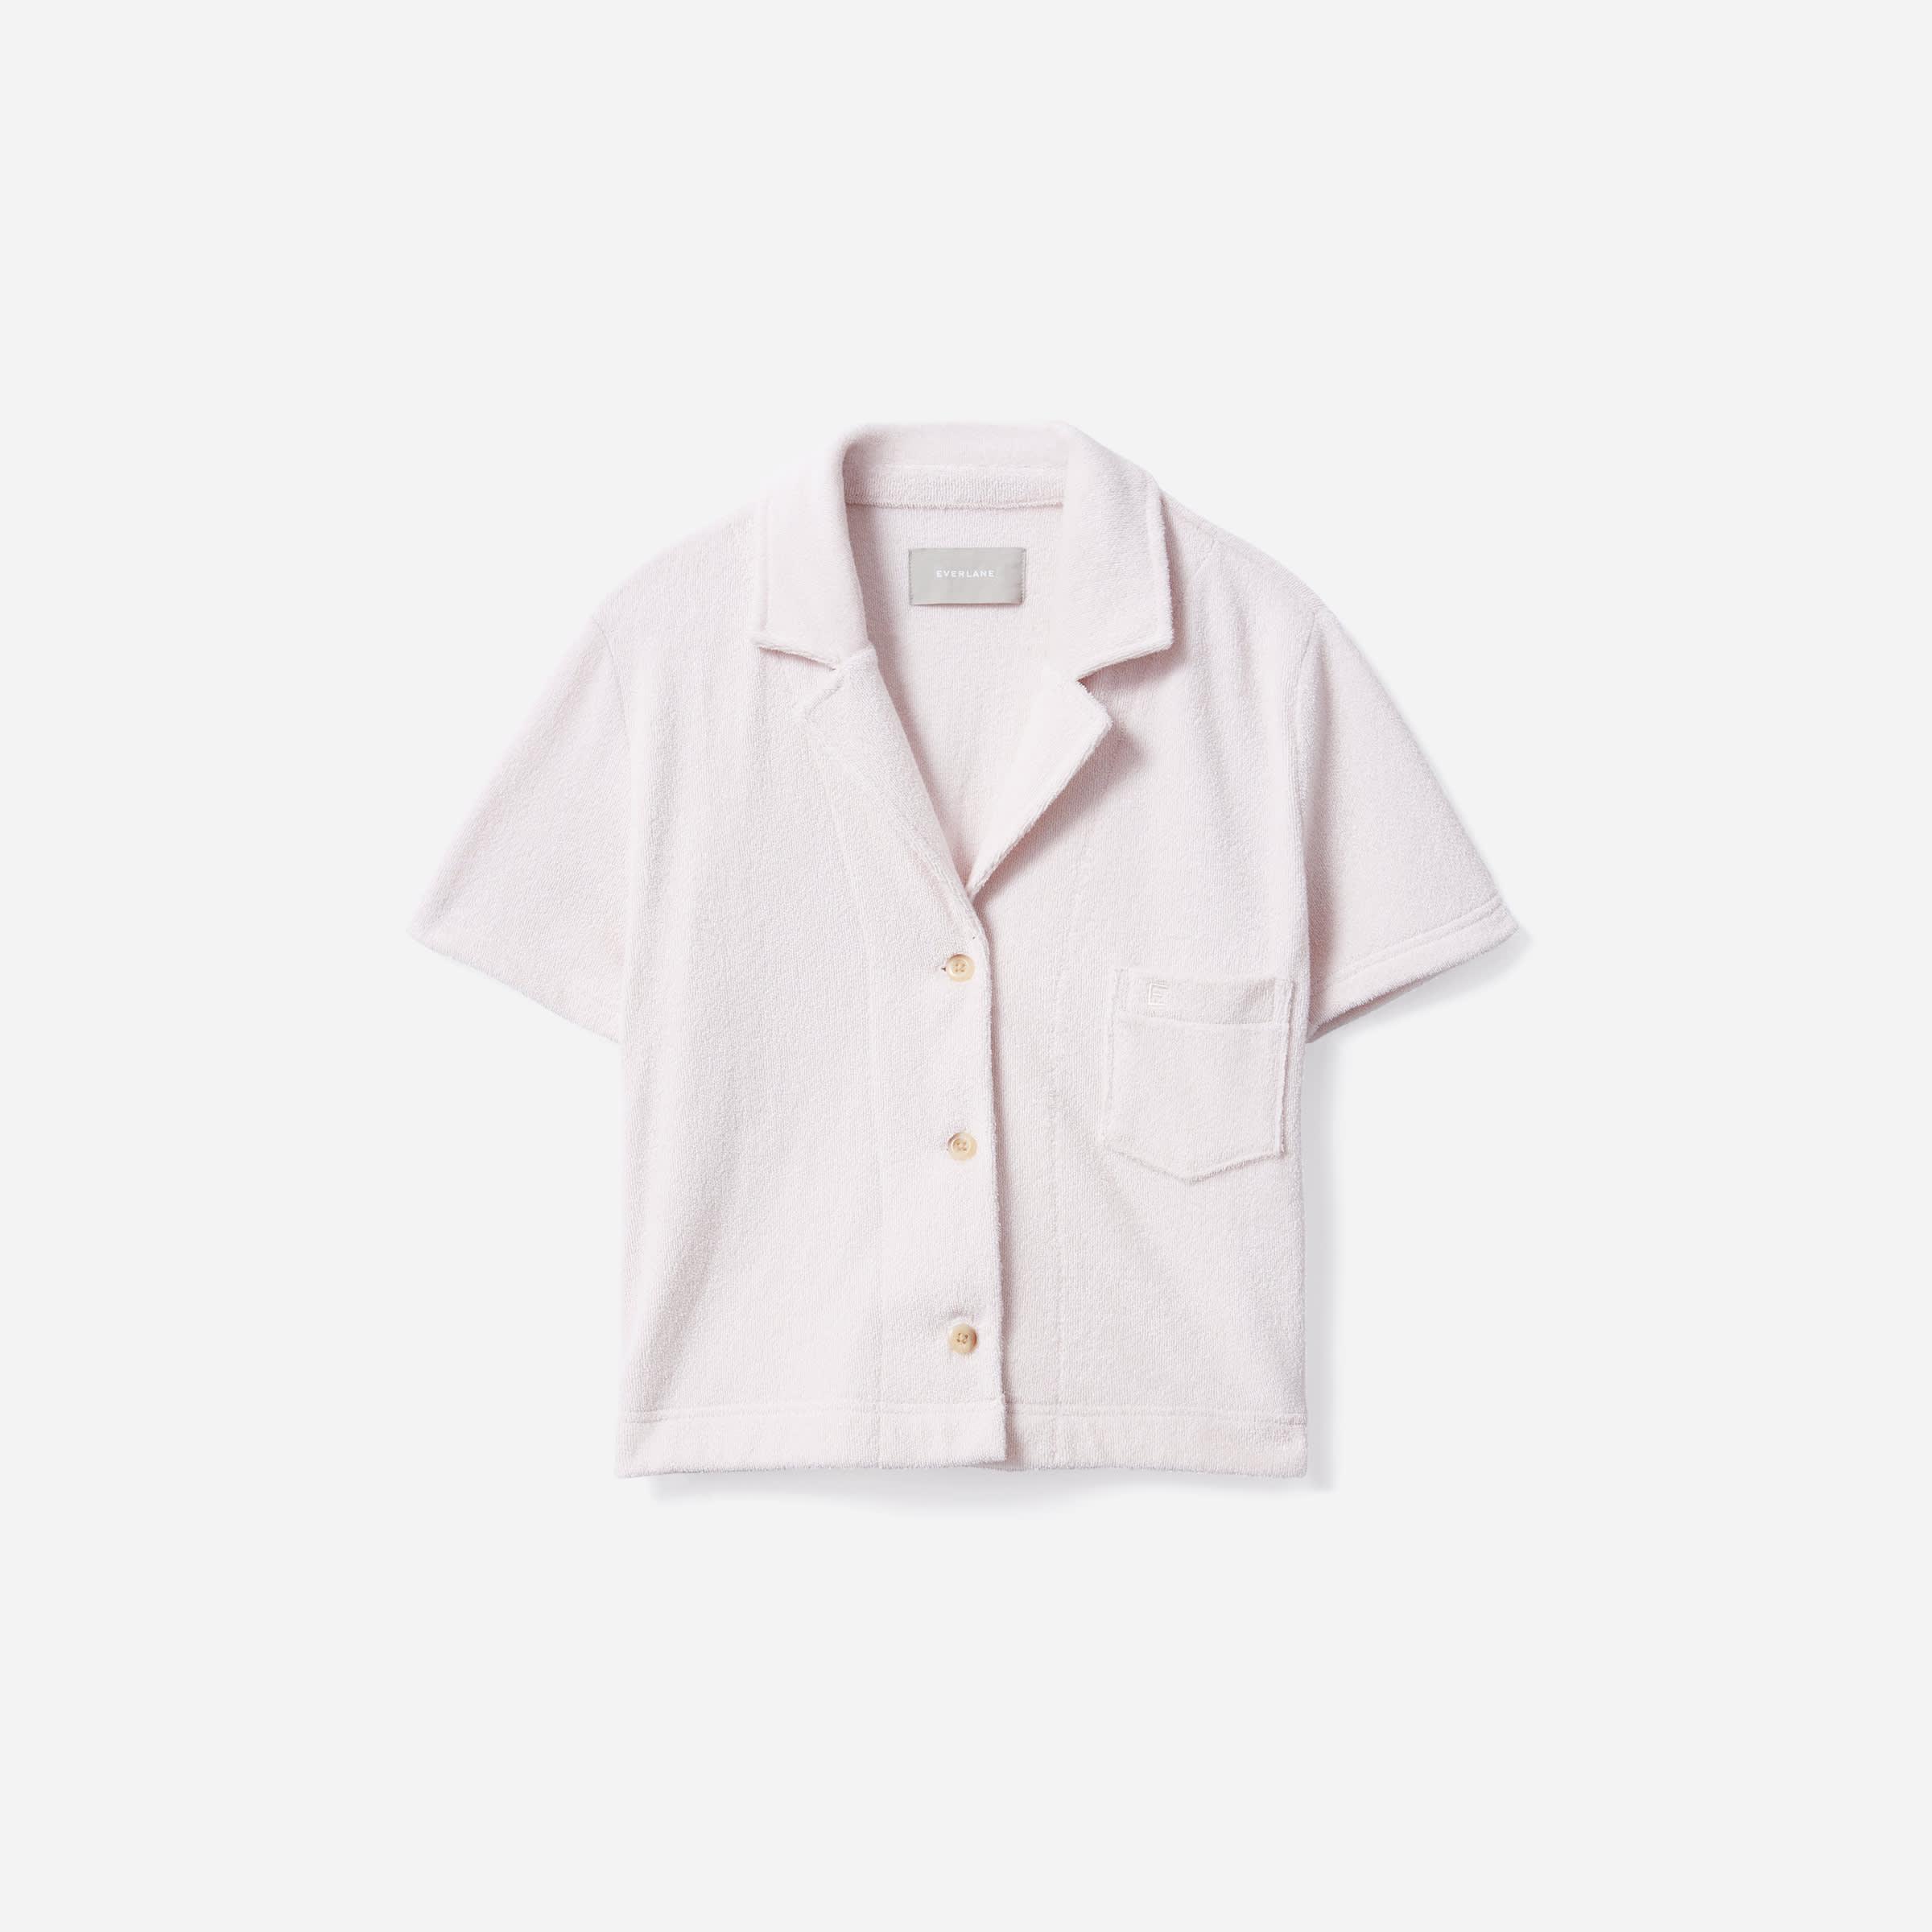 The Terry Cloth Notch Shirt | Everlane